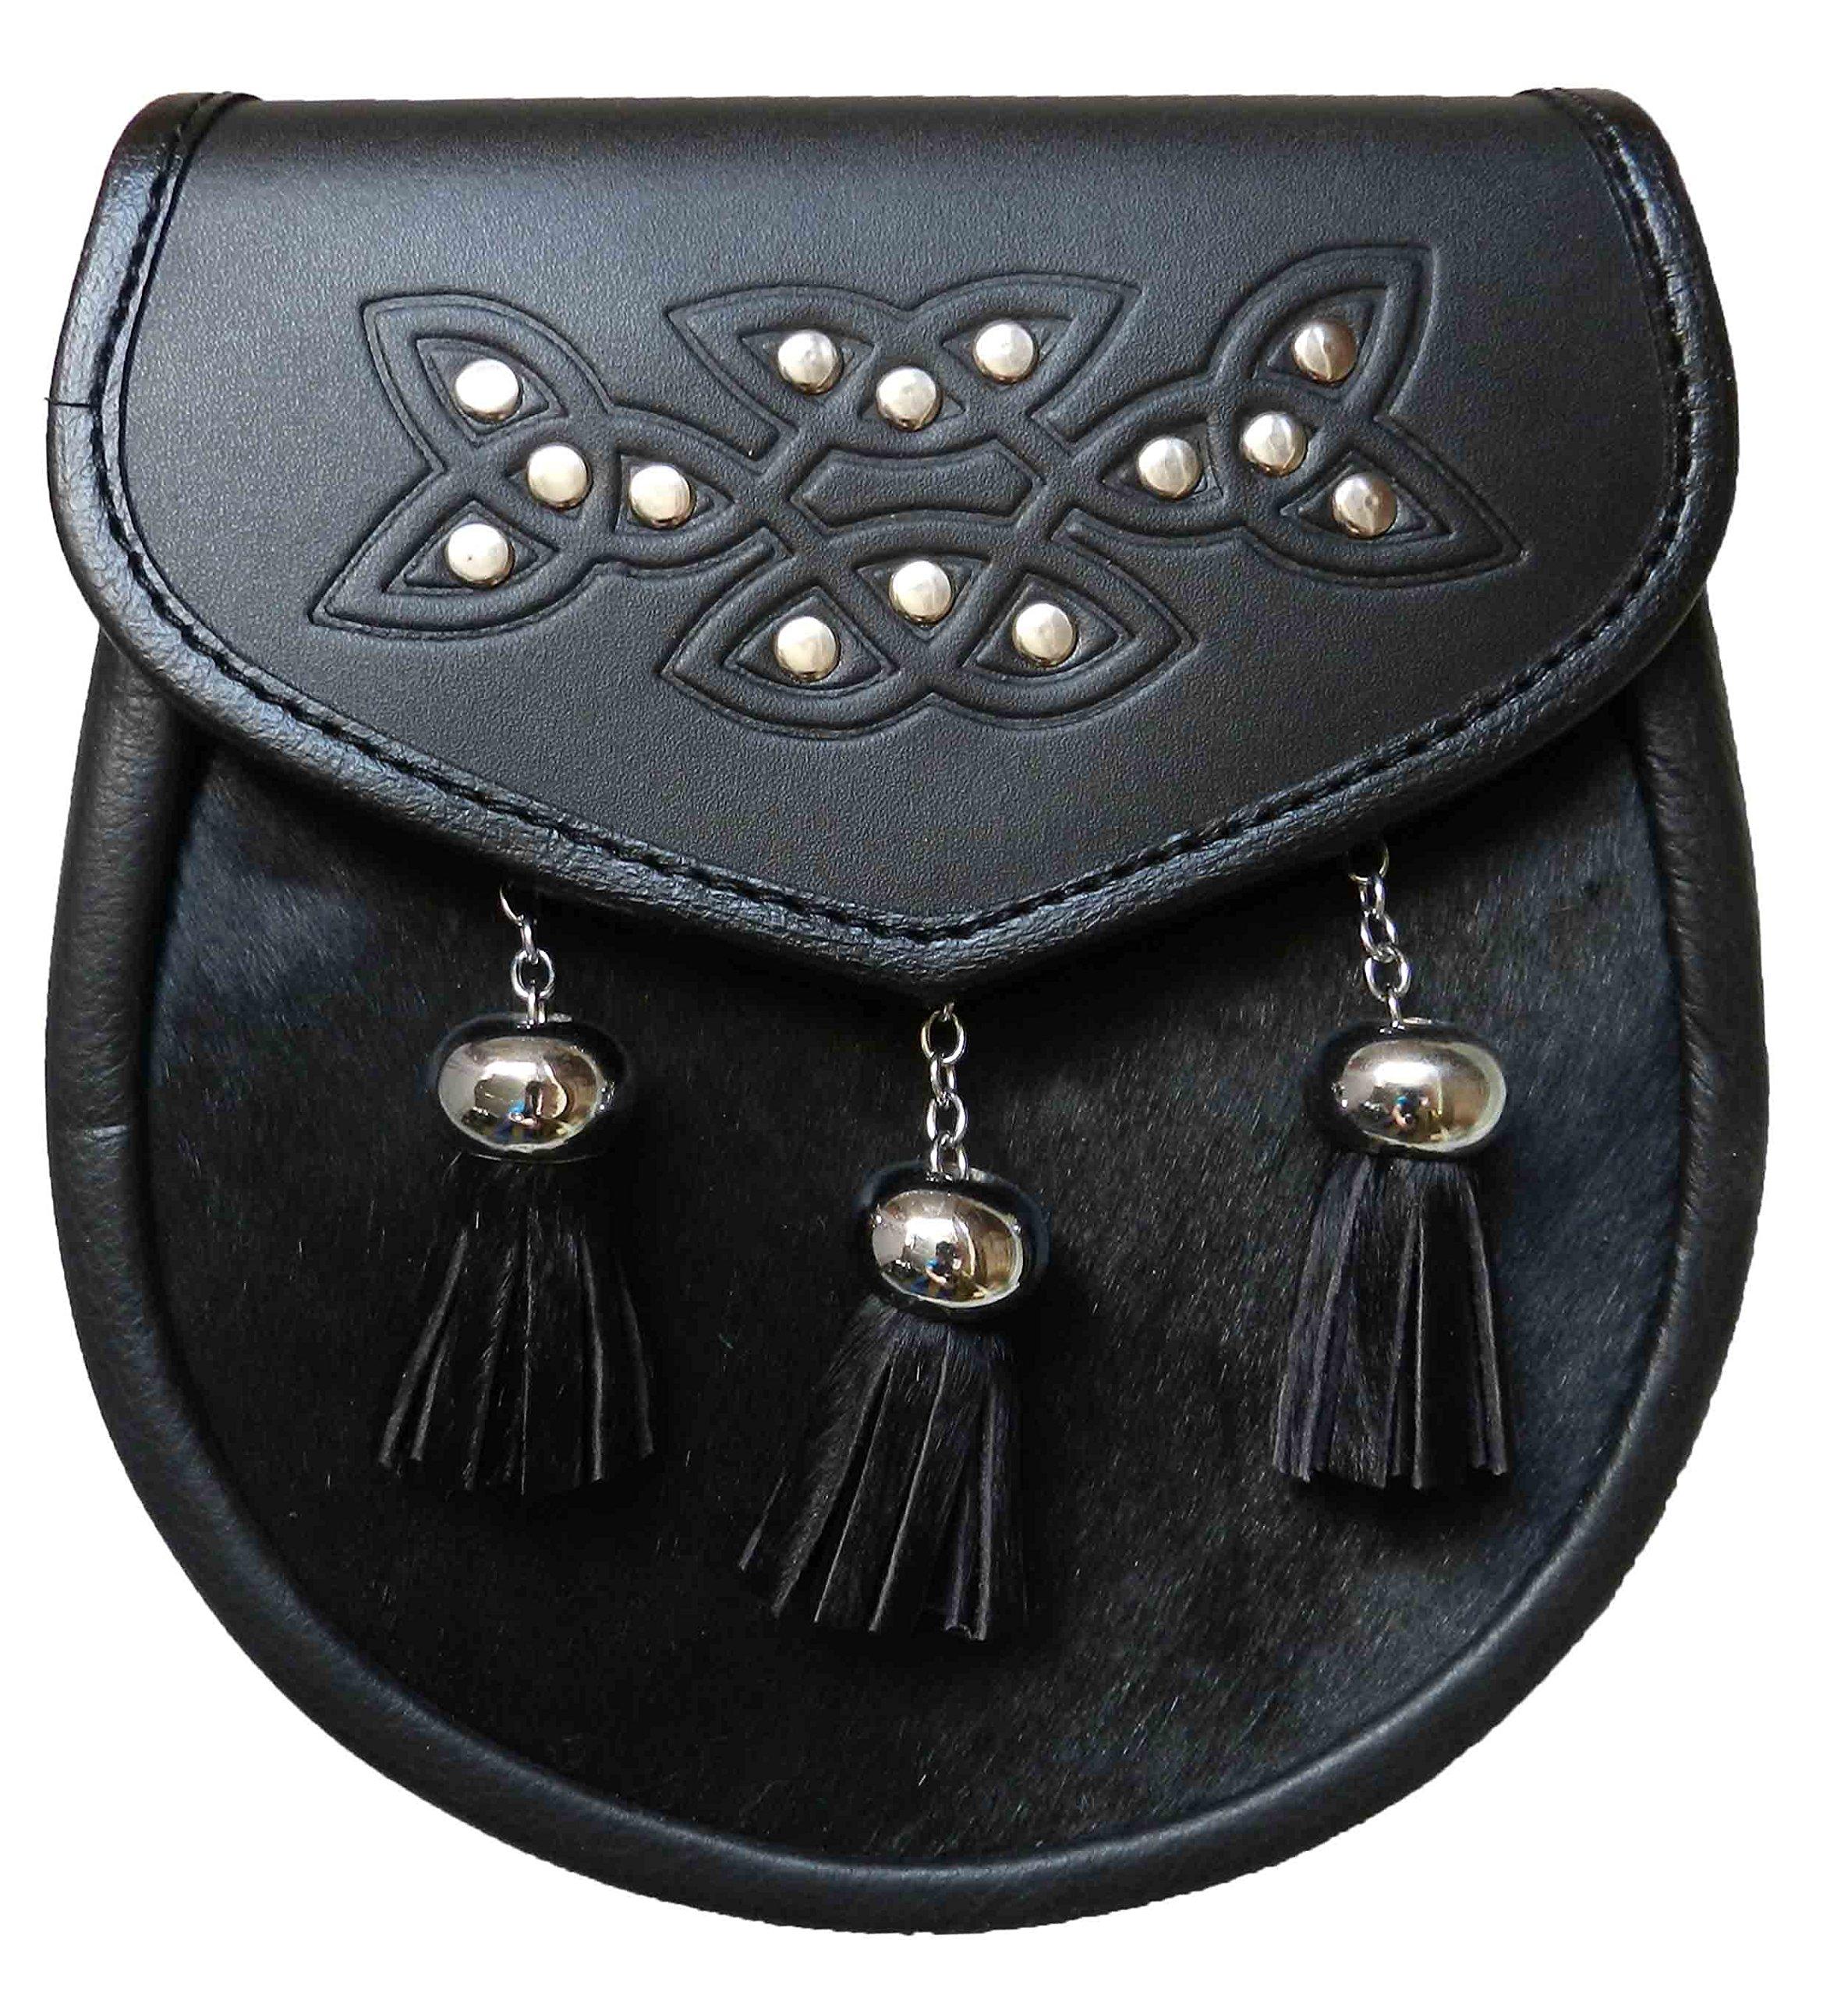 UT Kilts Semi Formal Faux Fur Leather Sporran with Tassels (Black) by UT Kilts